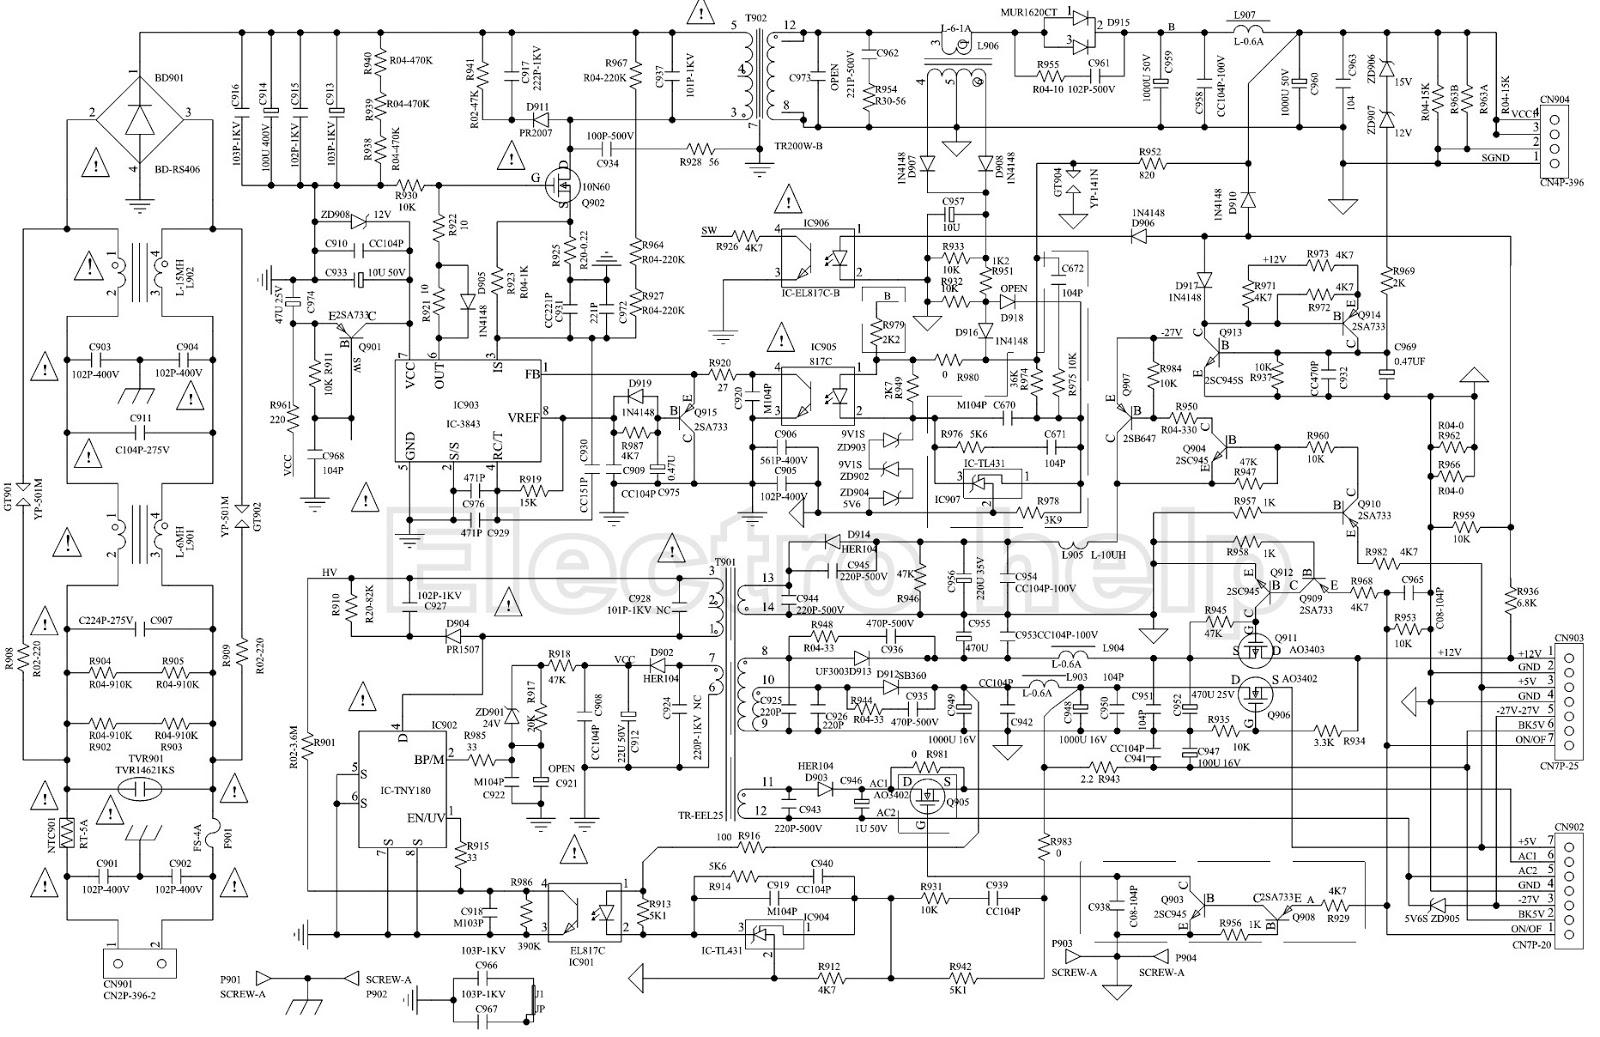 wildfire atv parts diagram html